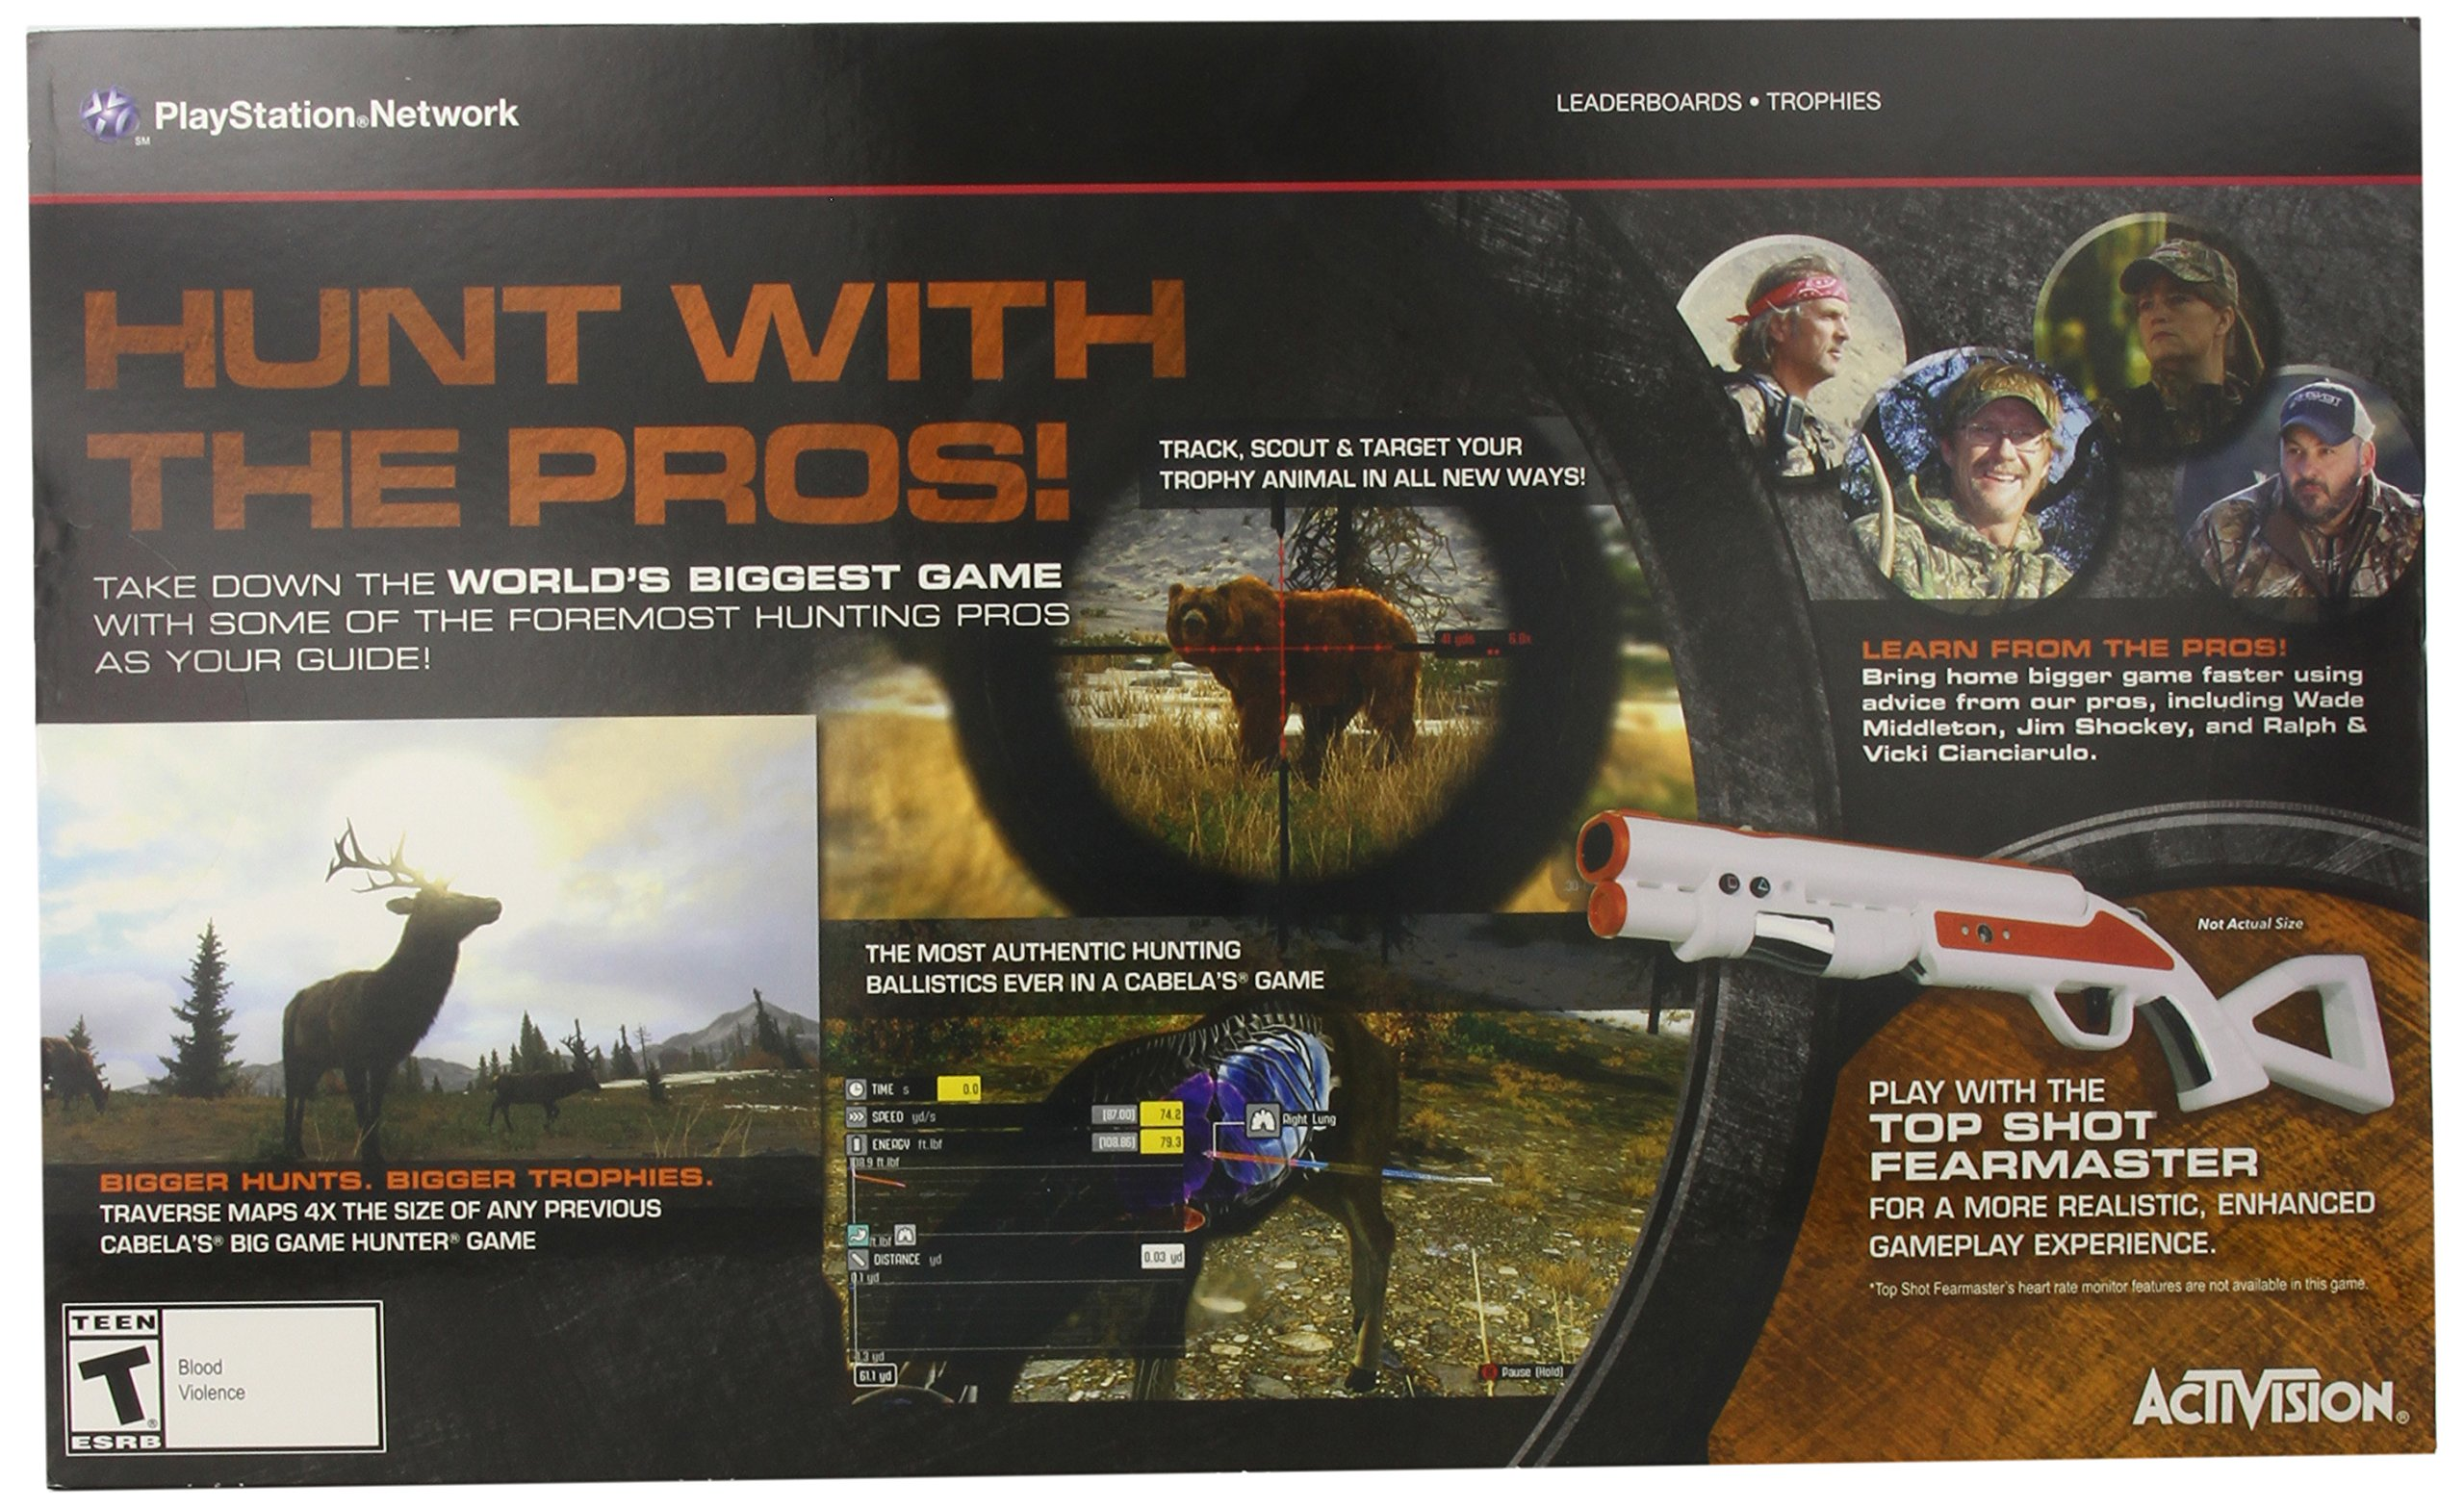 Cabela's: Big Game Hunter Pro Hunts with Gun - PlayStation 3 by Activision (Image #3)